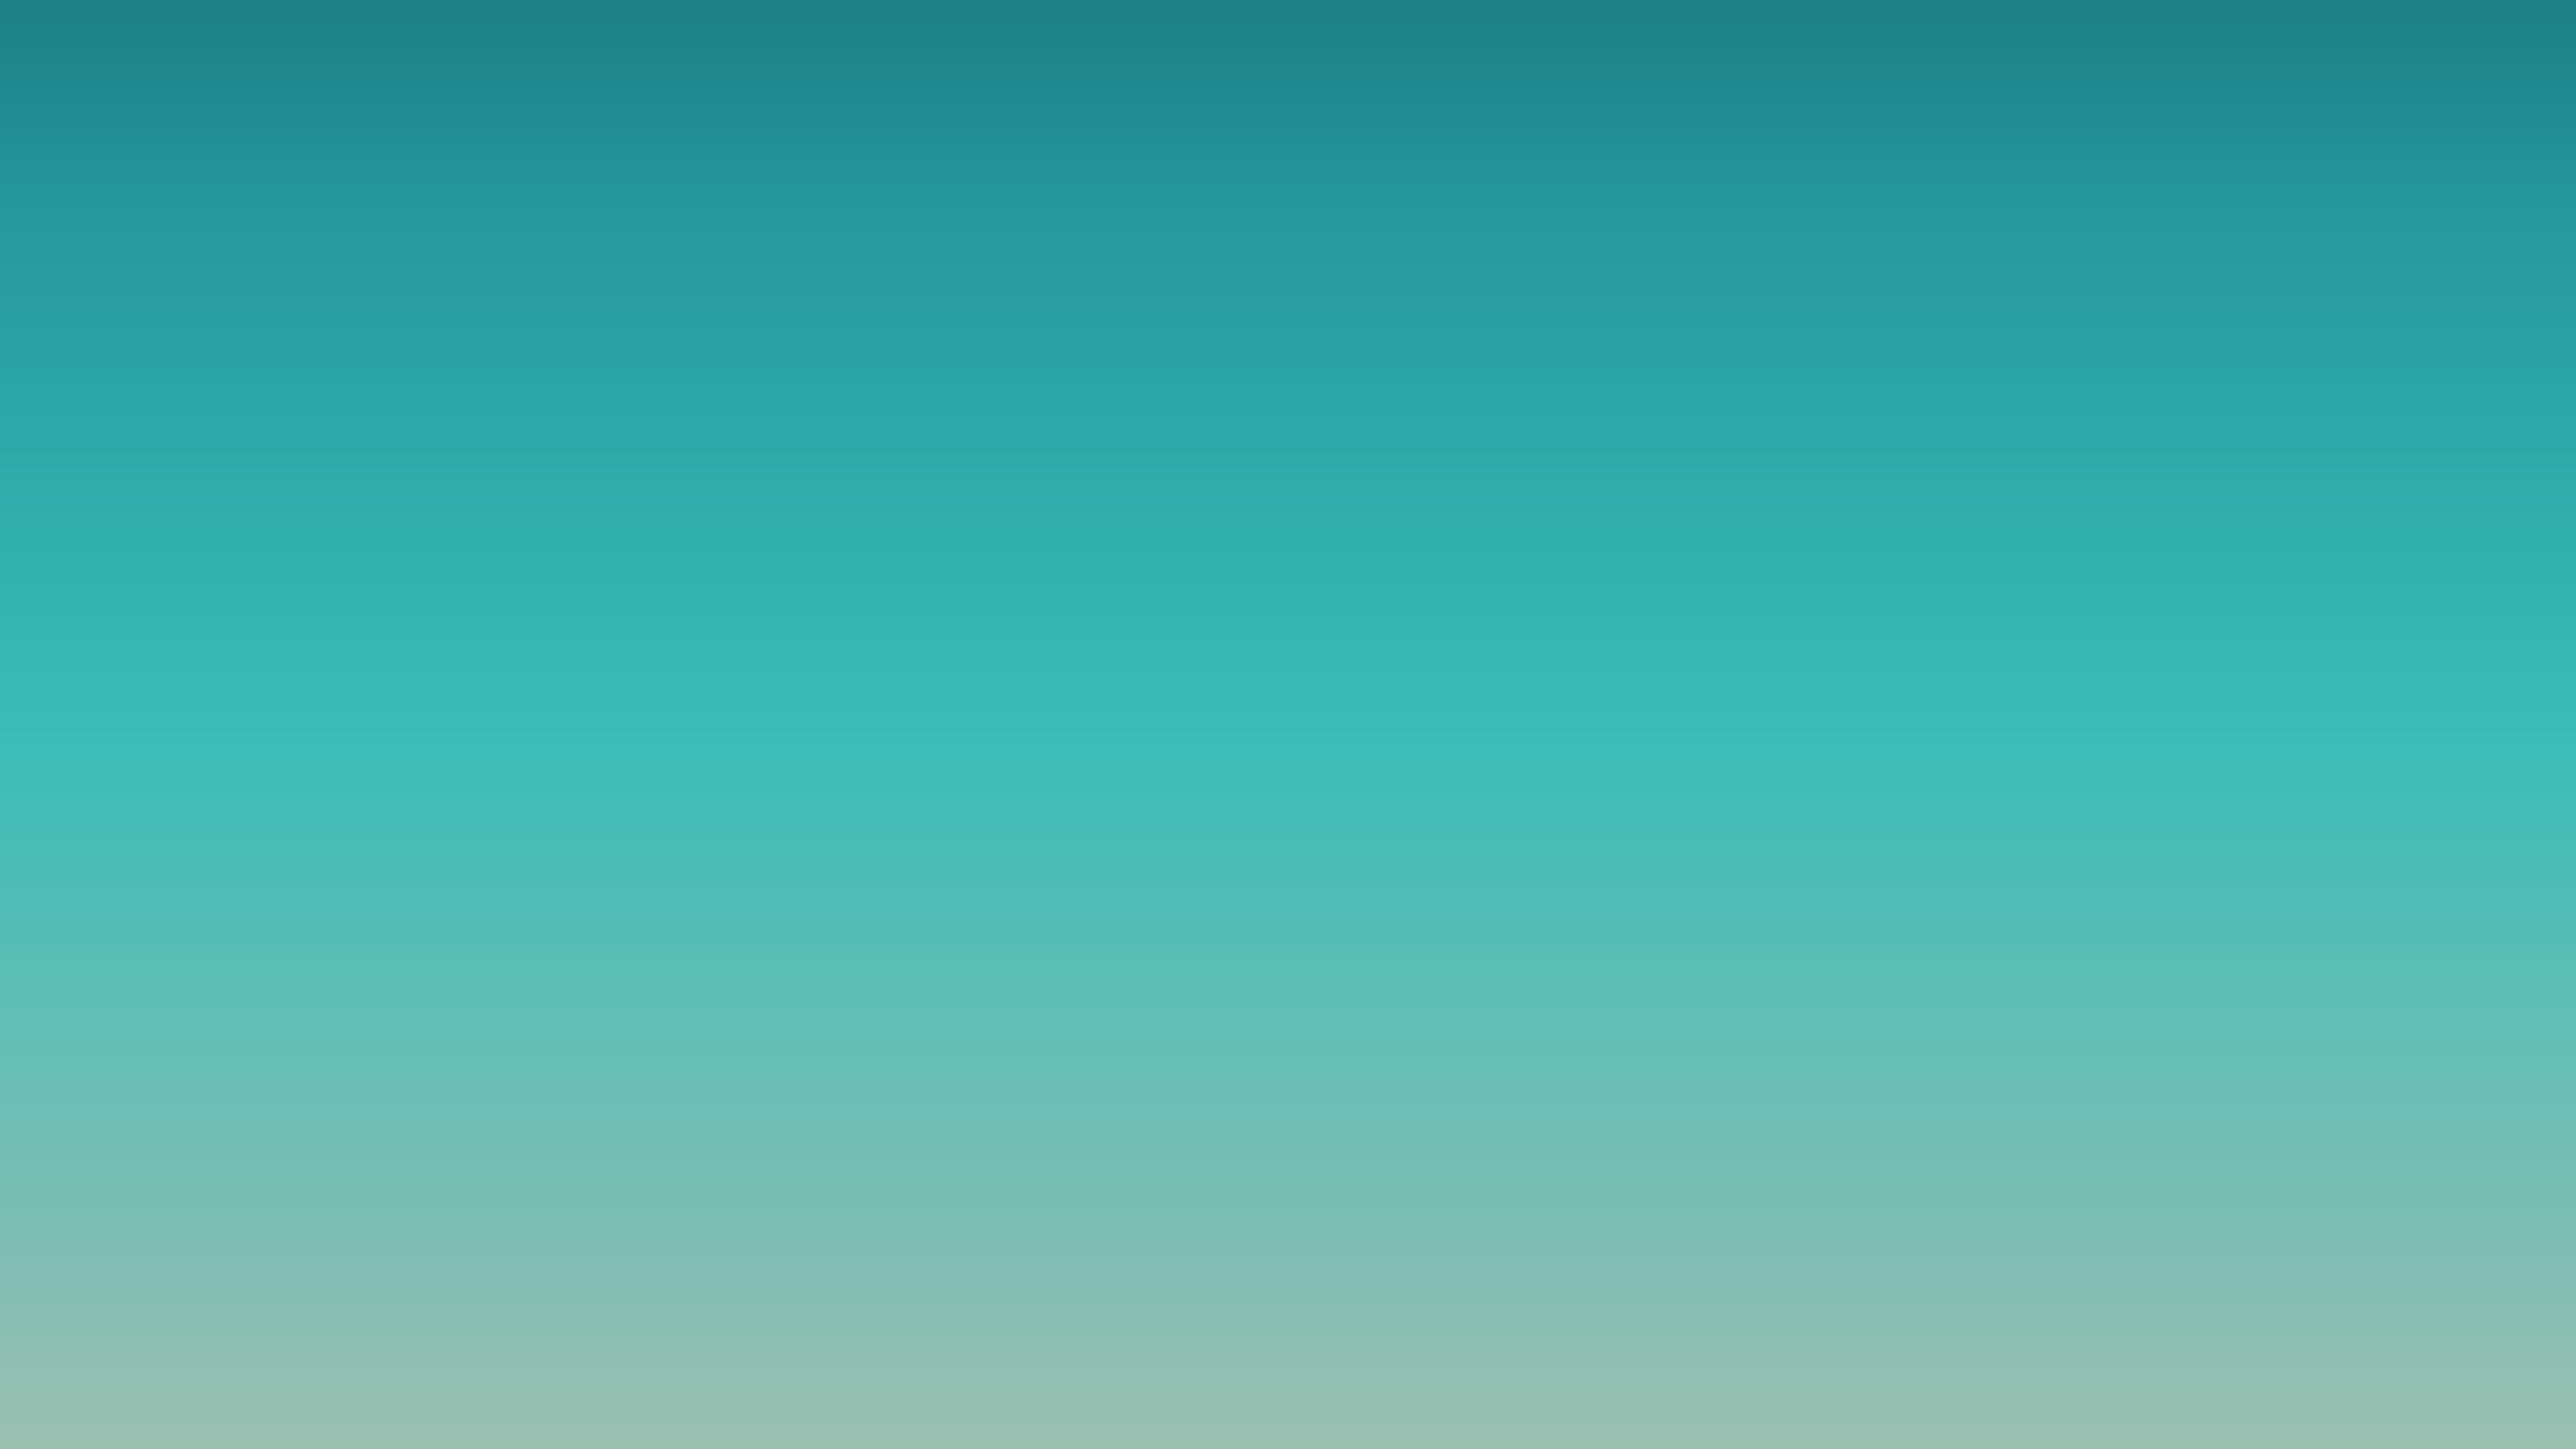 sl25-iphone8-ios11-blue-background-apple-blur-gradation ...